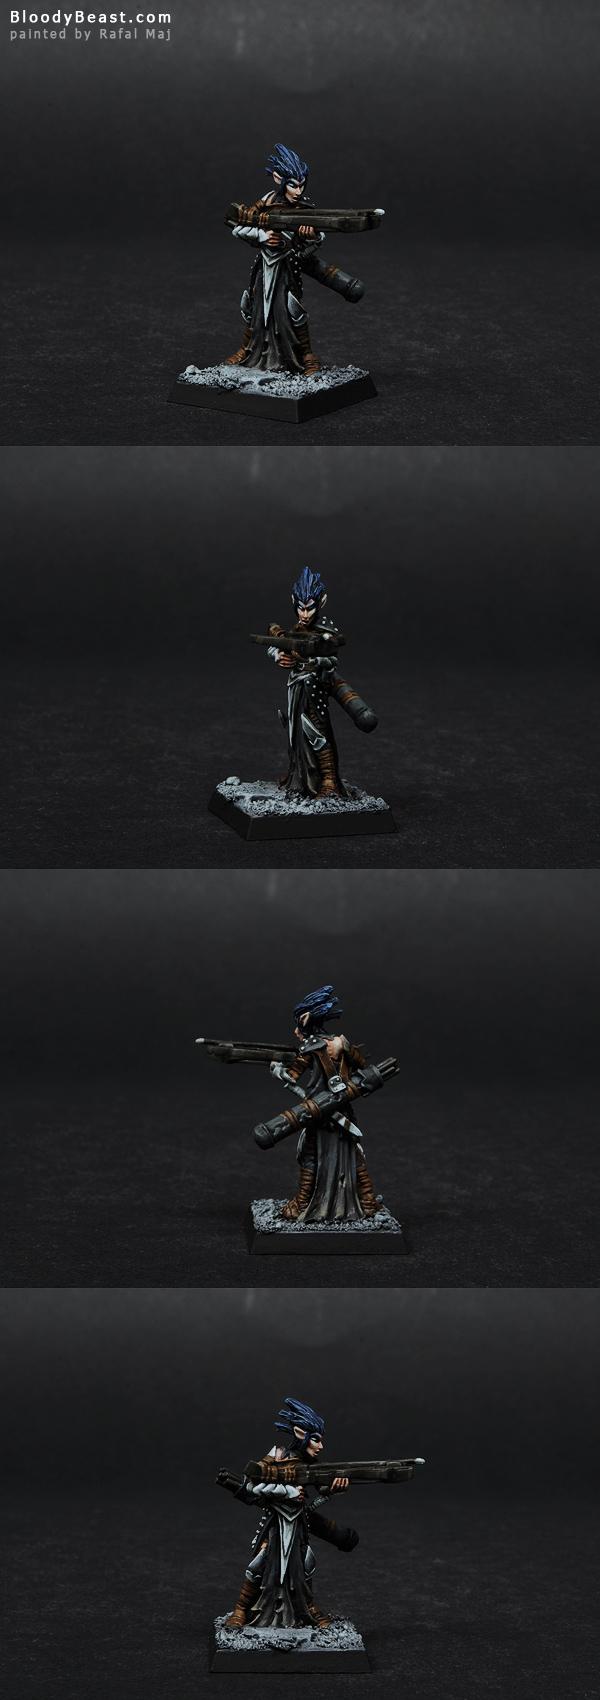 Darkreach Shiver Spike painted by Rafal Maj (BloodyBeast.com)